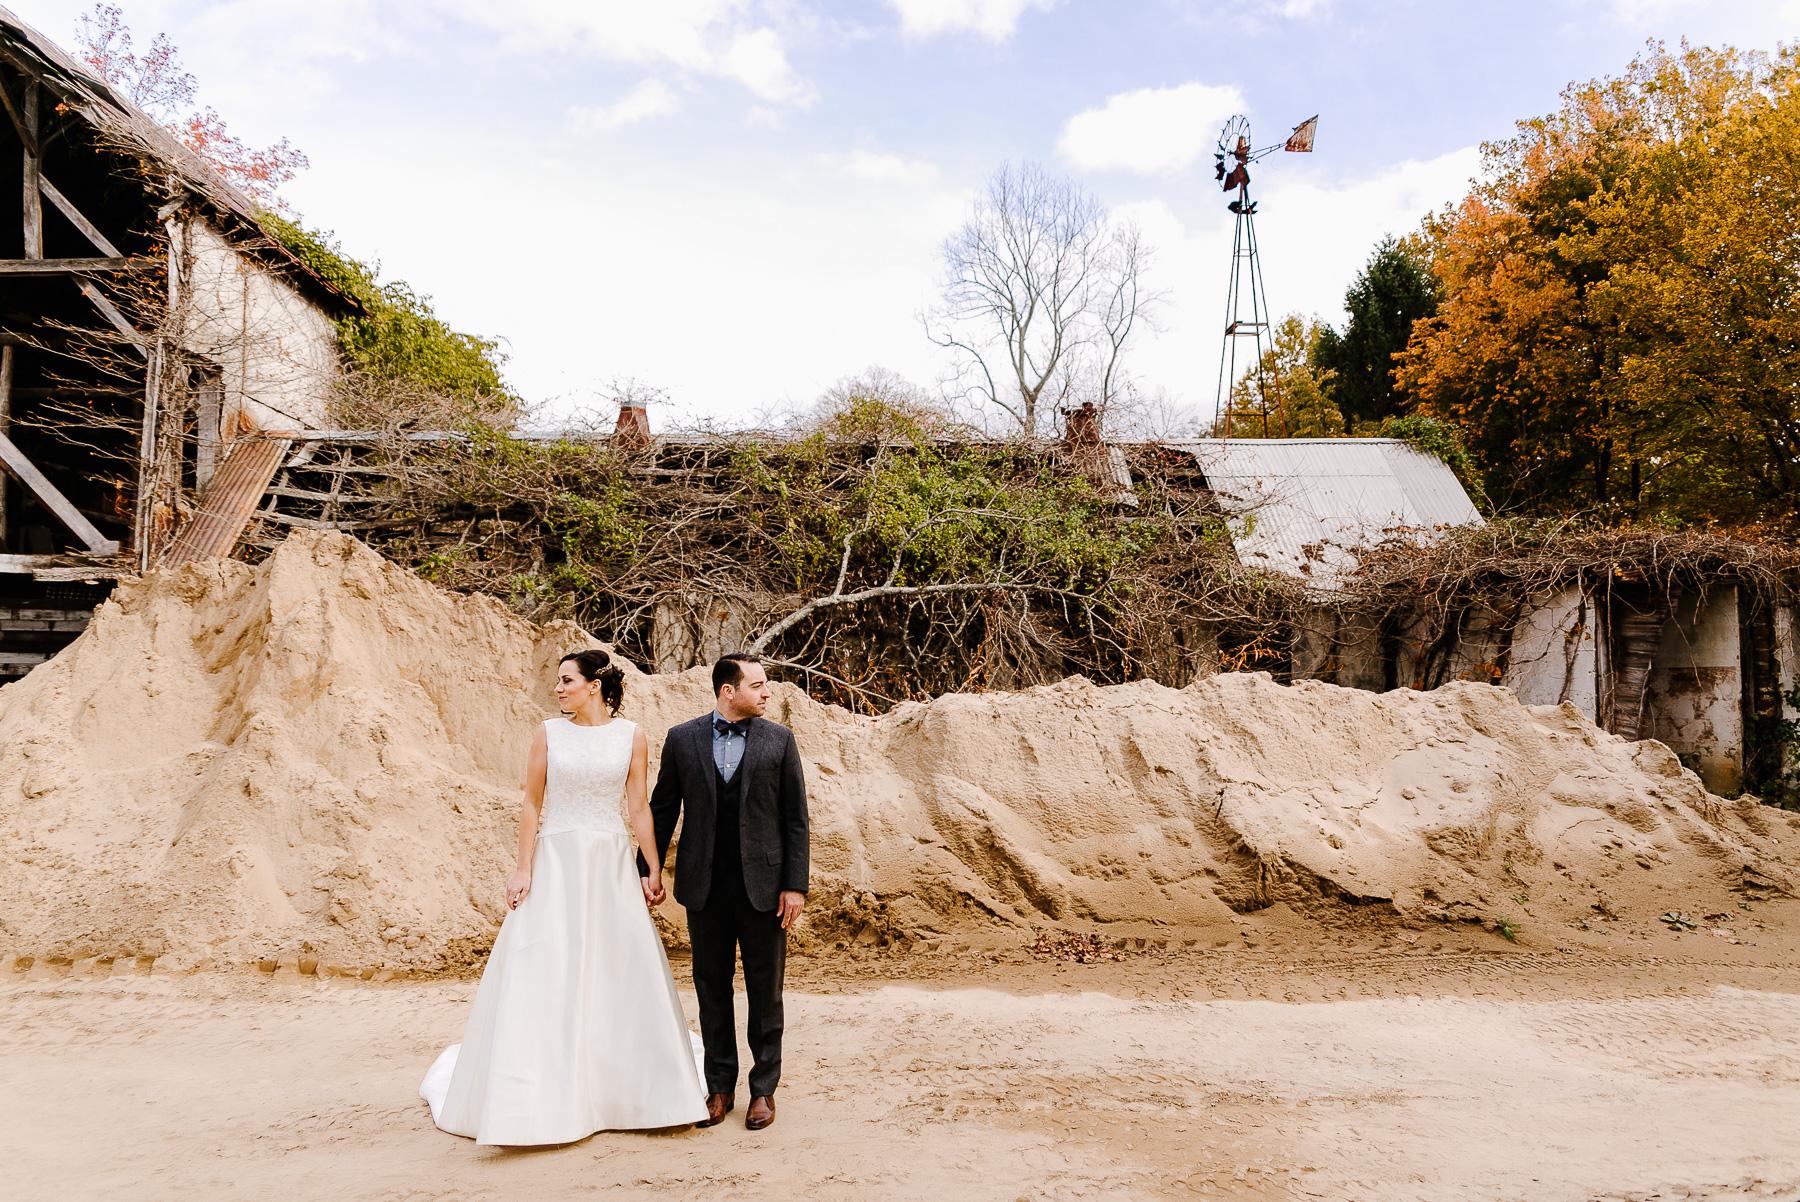 37-Laurita Winery Wedding New Jersey Wedding Photographer Laurita Winery Weddings Longbrook Photography.jpg